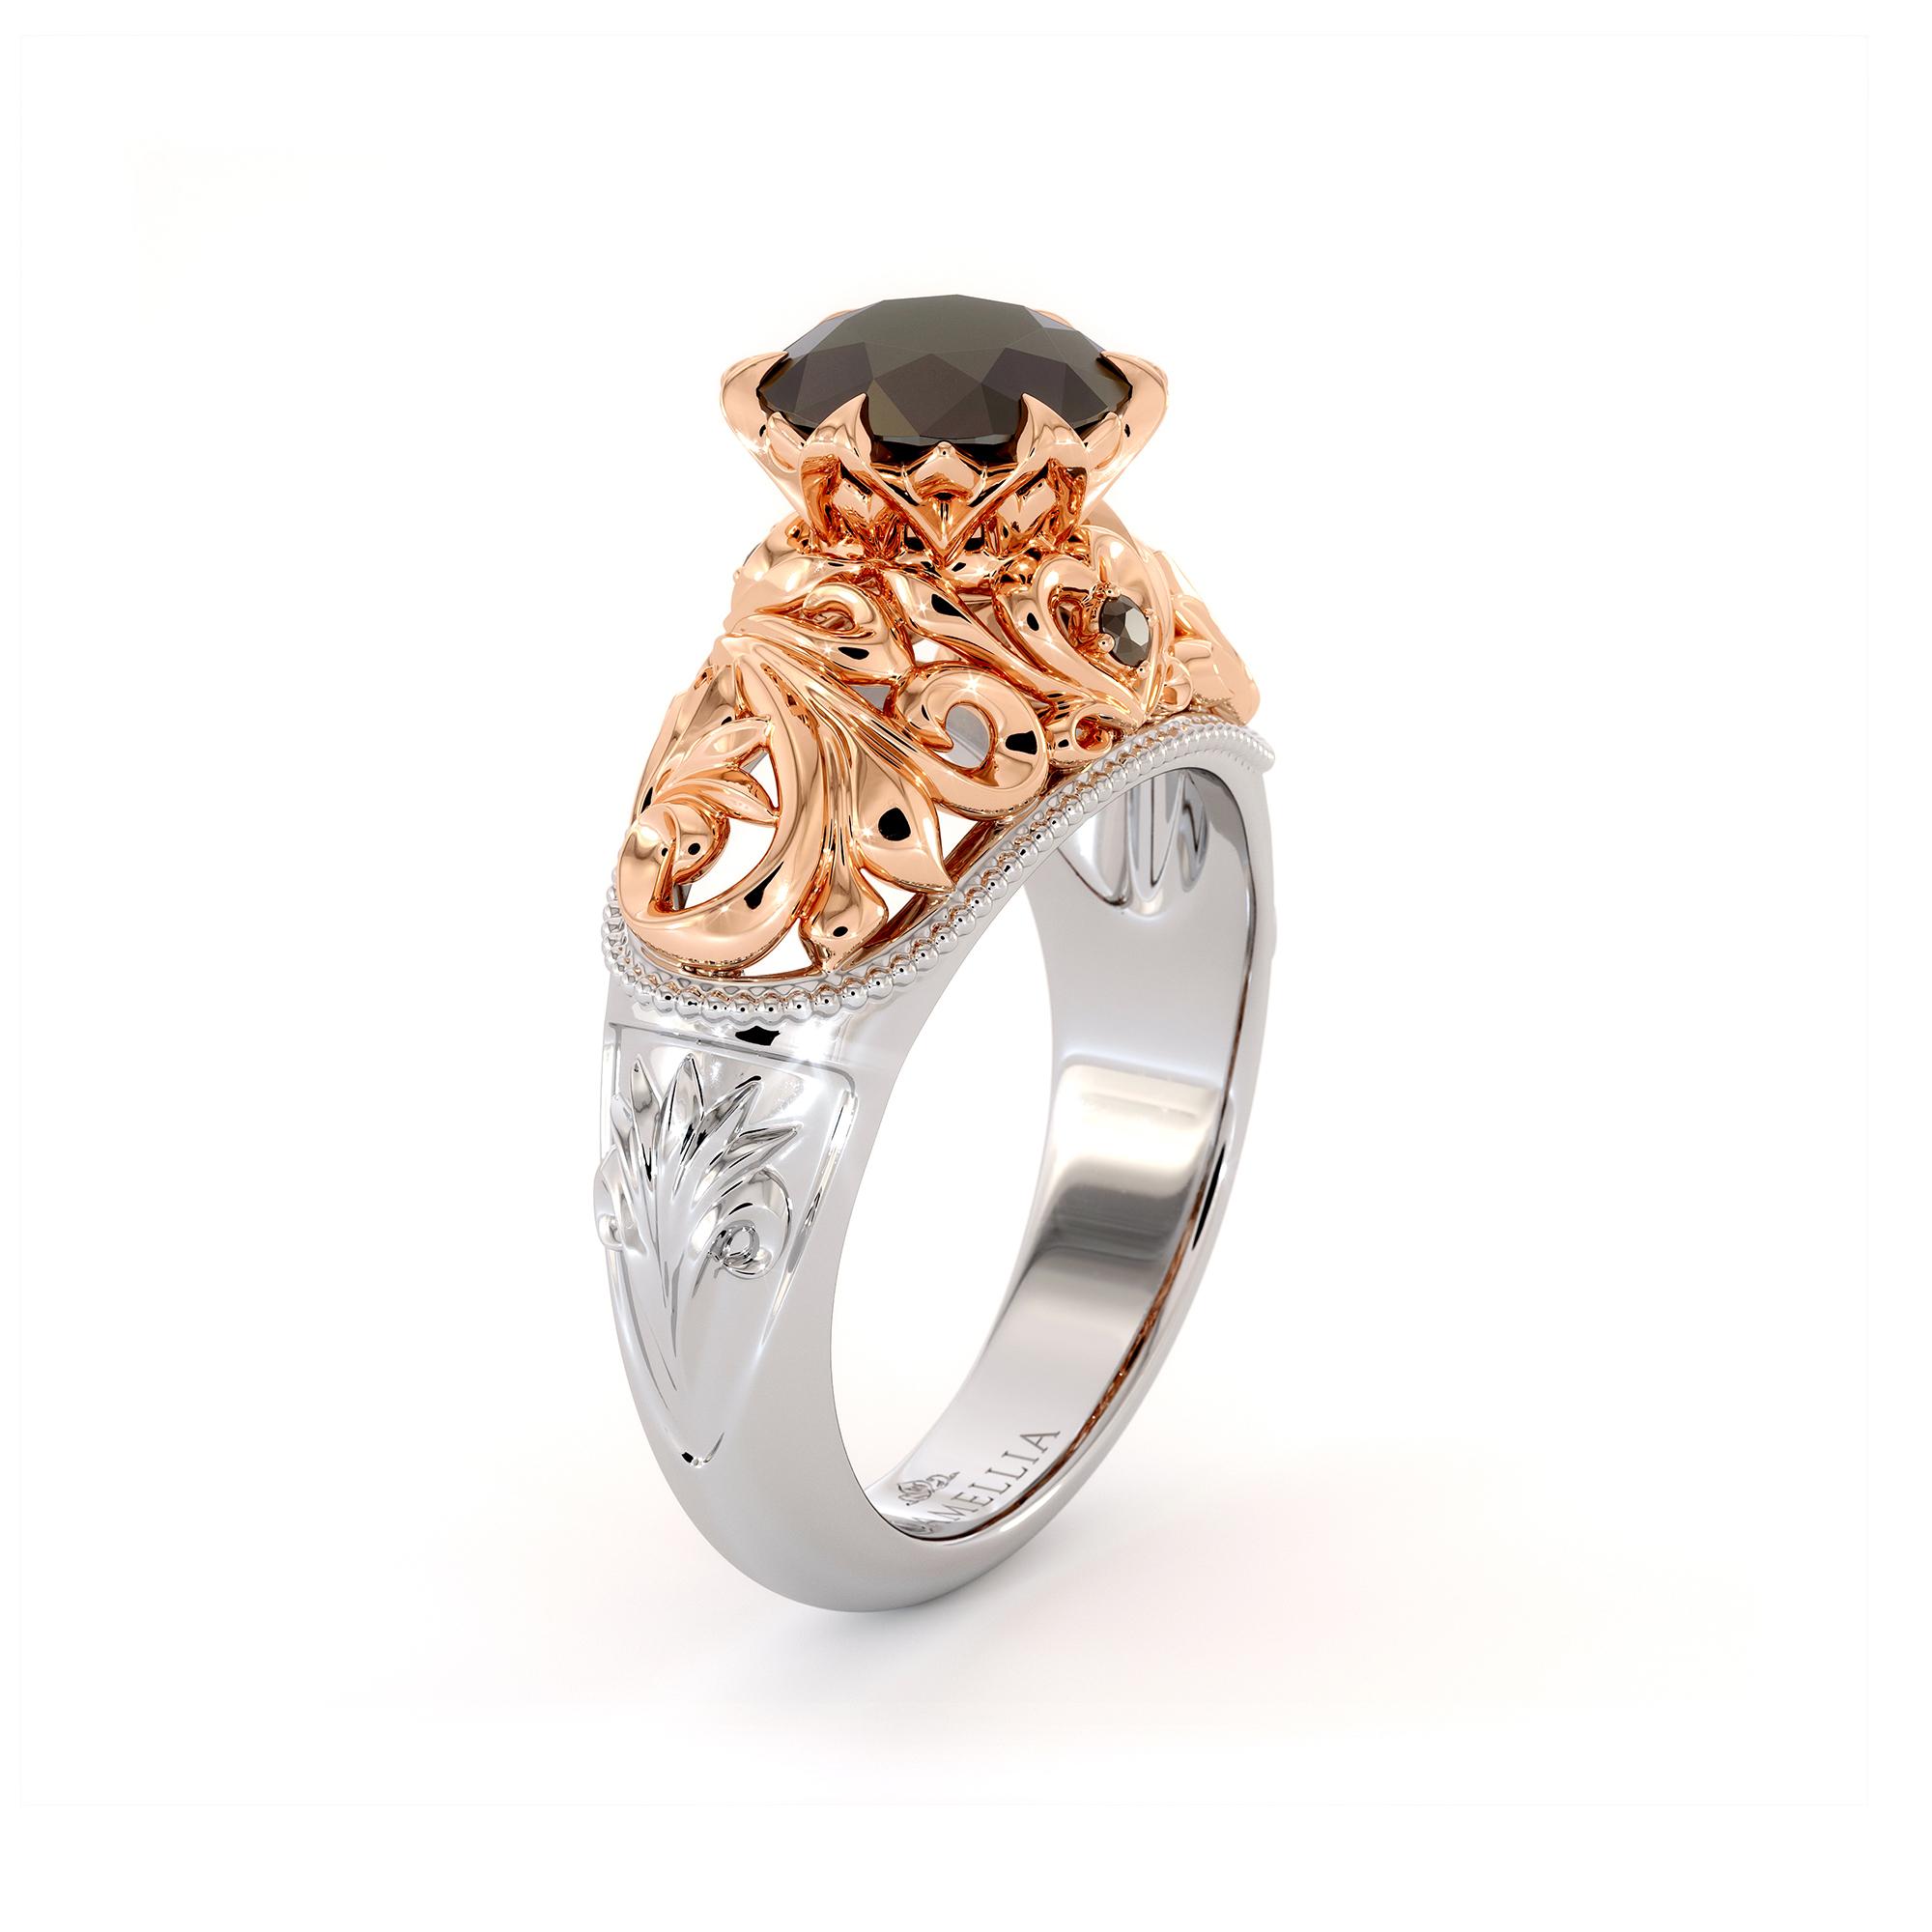 Black Diamond Royal Engagement Ring Heart Shape Filigree Engagement Ring 2 Toned Gold Ring Black Diamonds Ring